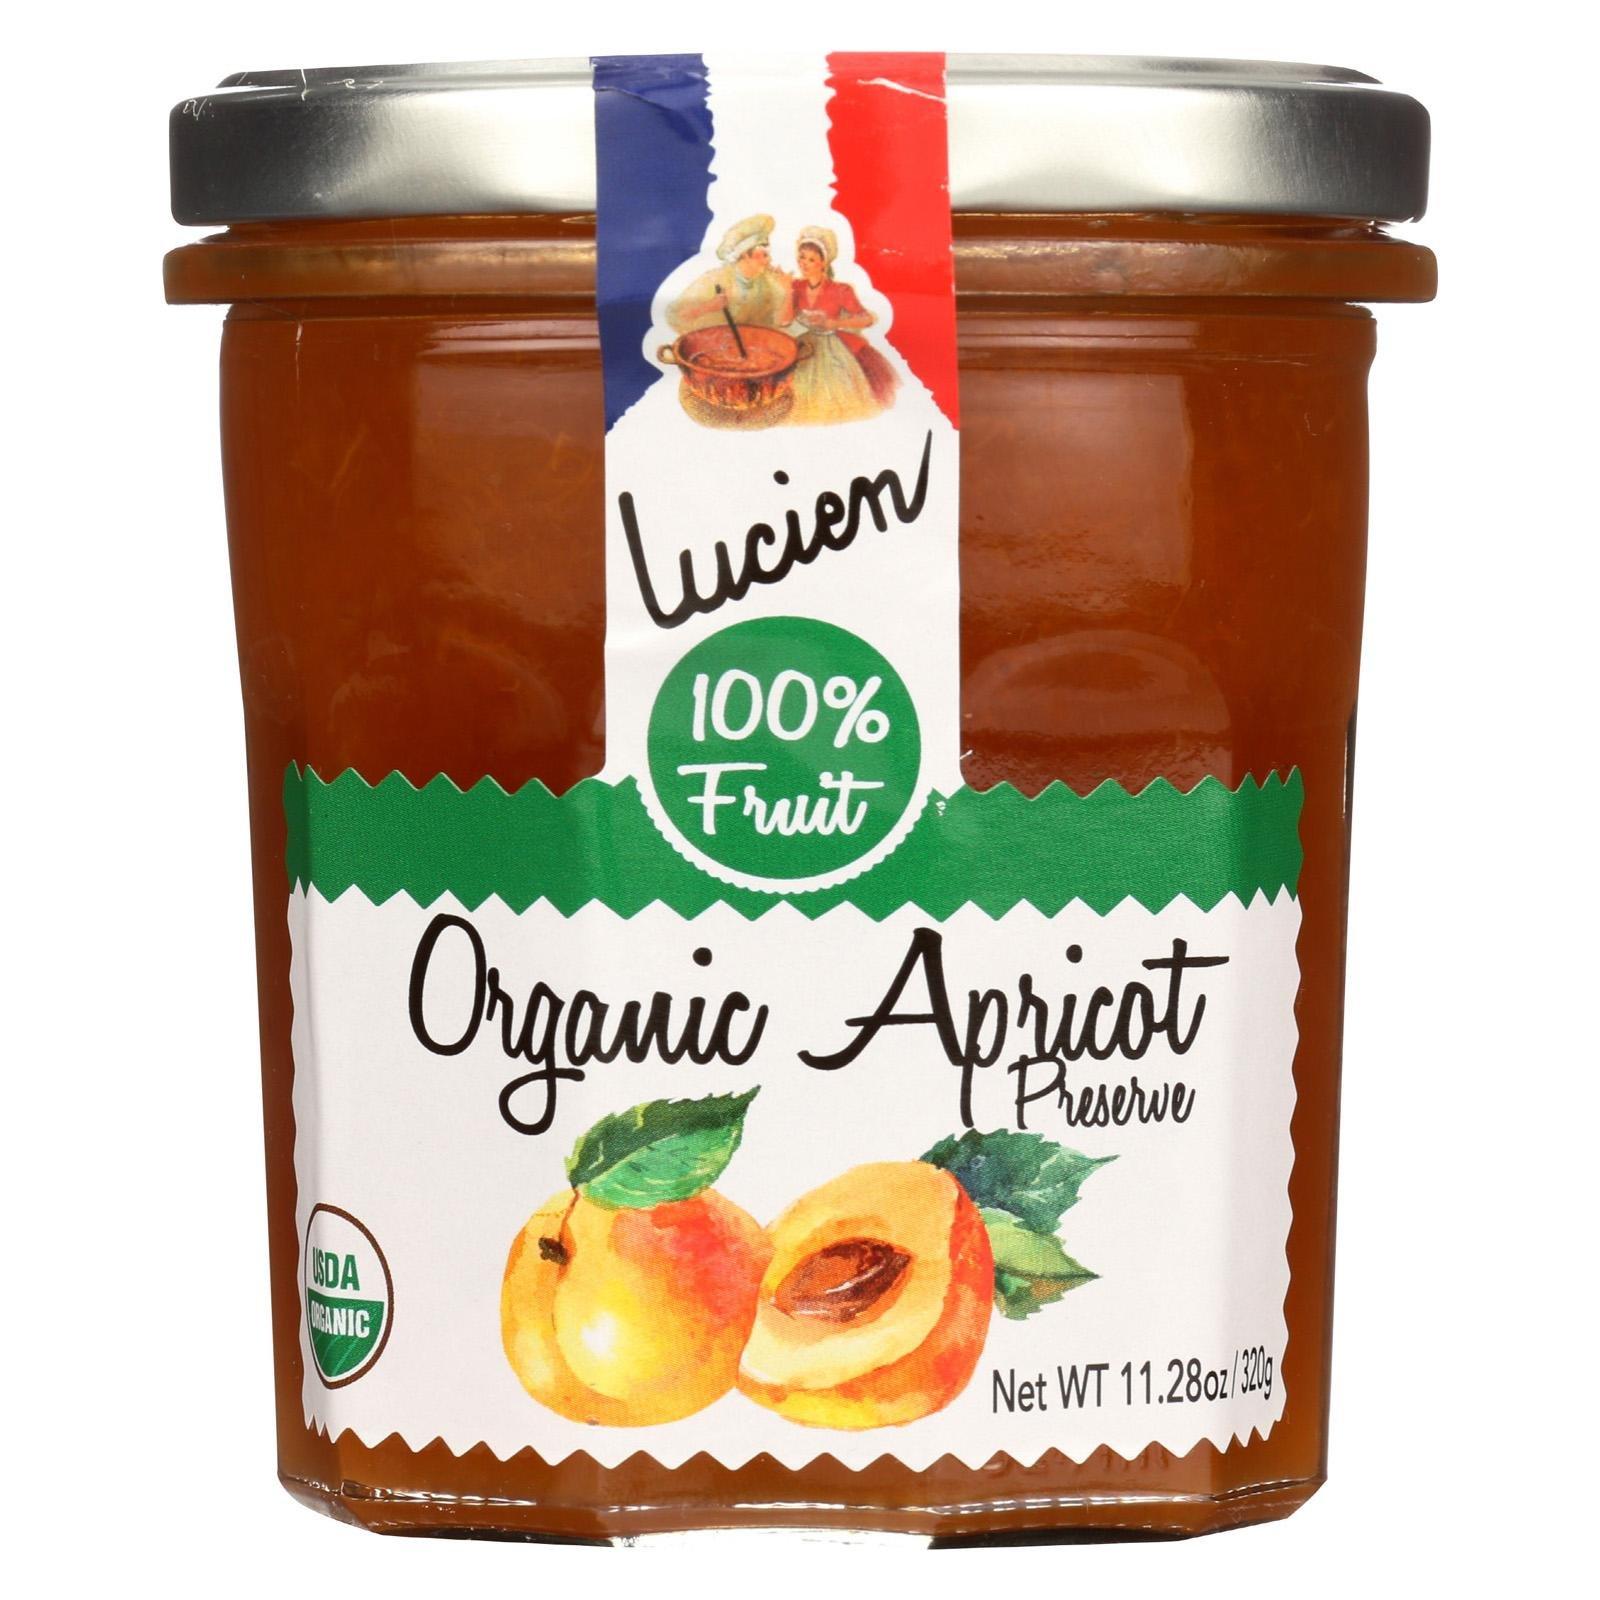 LUCIEN GEORGELIN, Frt Spread, Og1, Apricot, Pack of 6, Size 11.28 OZ, (Gluten Free Low Sodium Vegan Wheat Free Yeast Free 95%+ Organic)